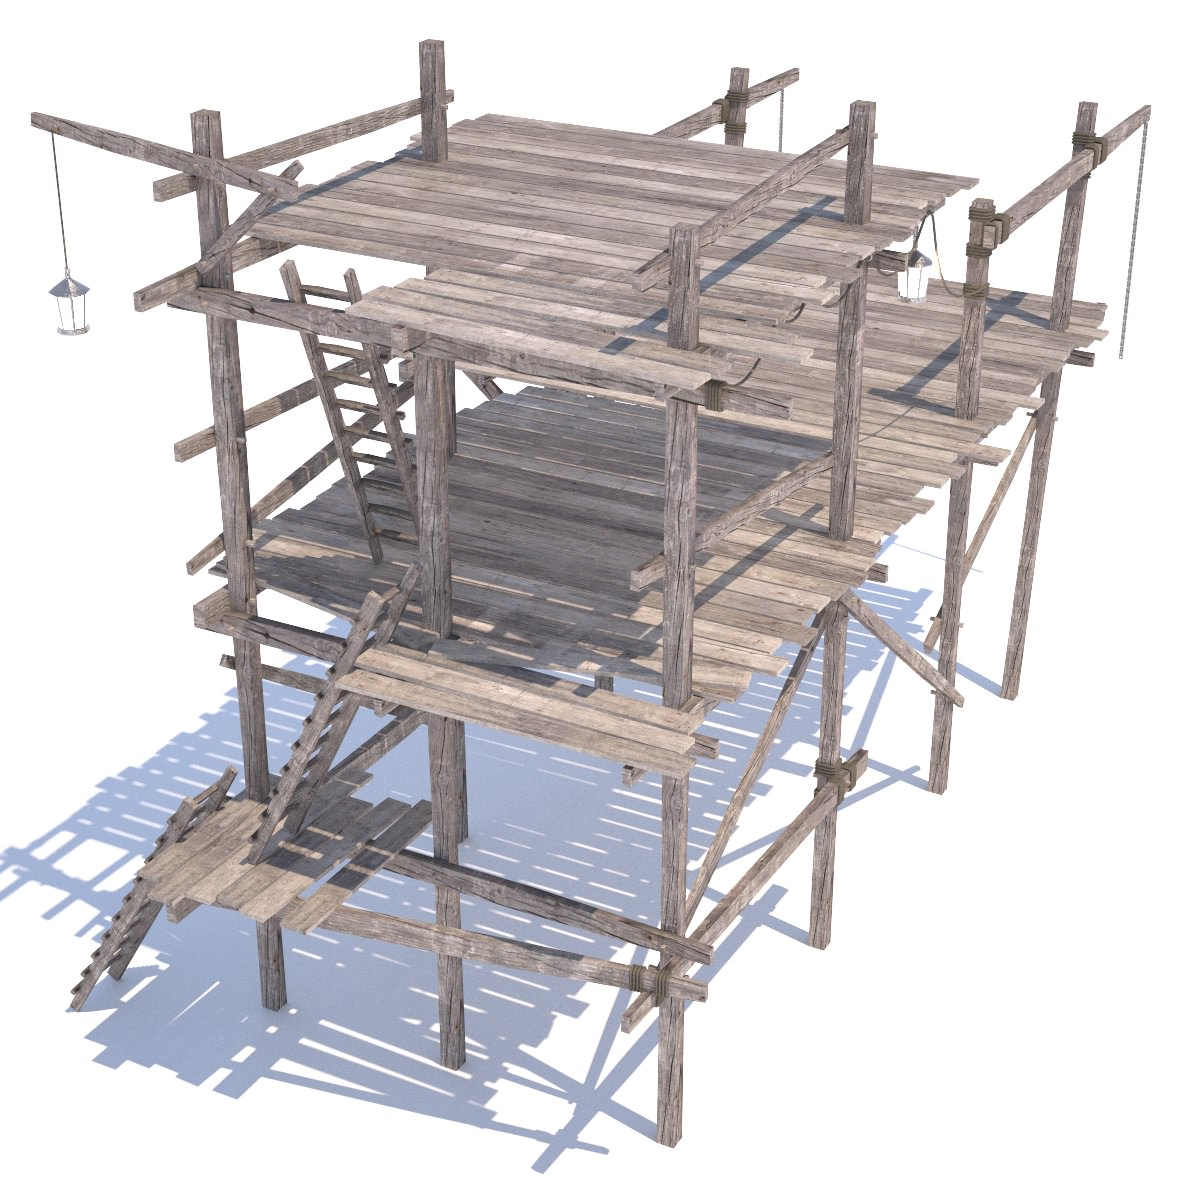 Old Wooden Scaffolding 3d Model Obj 3ds Fbx Hrc Xsi